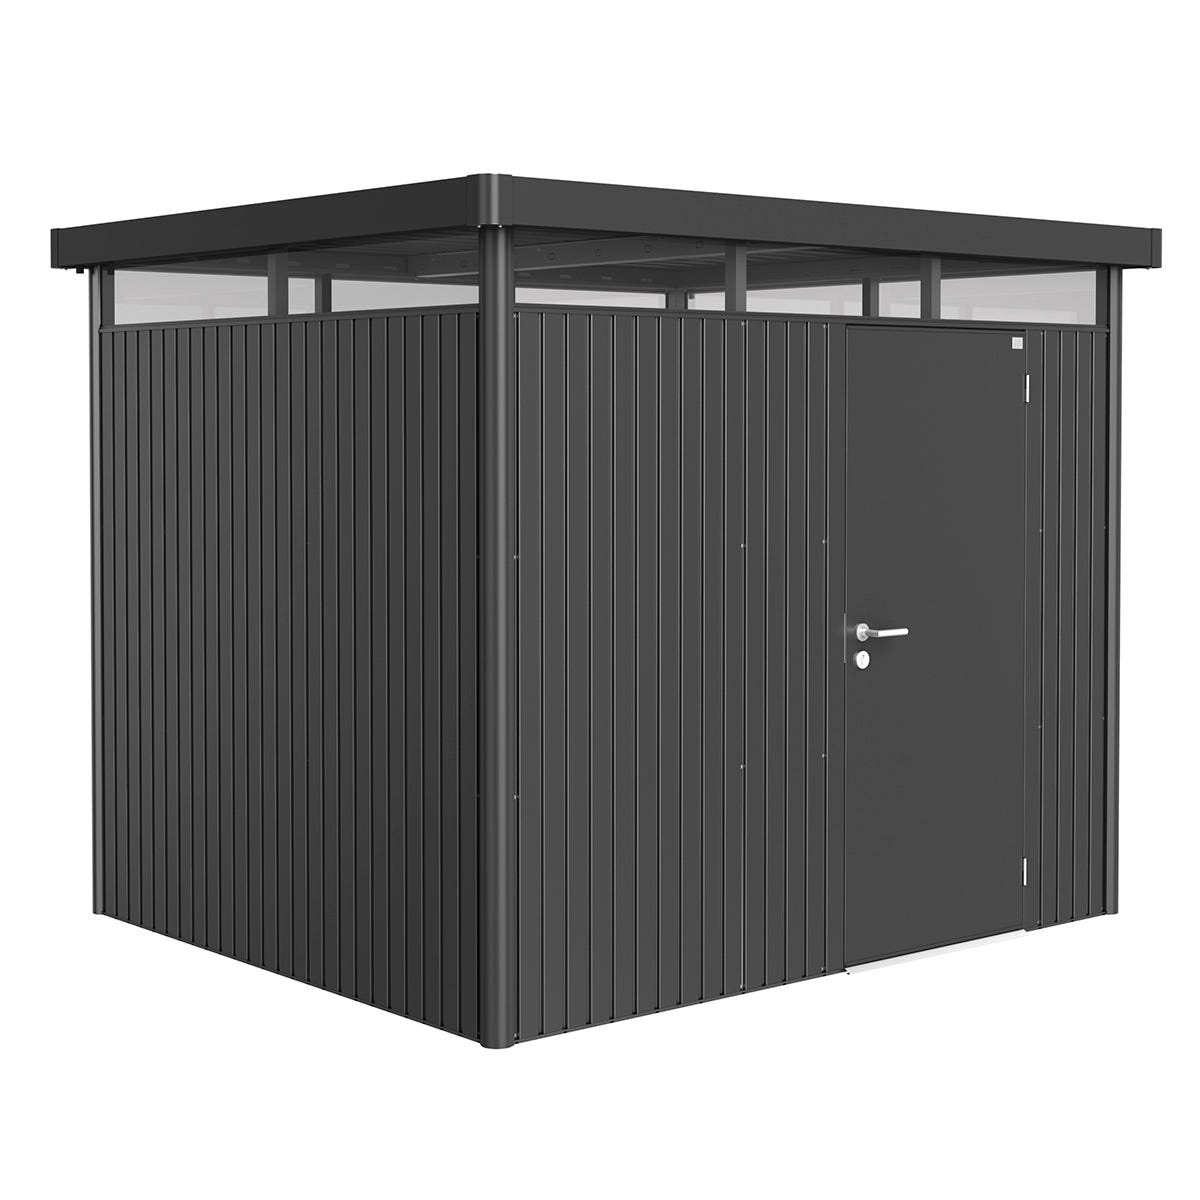 Biohort Highline Metal Shed H3 Standard door 9 x 8 - Dark Grey